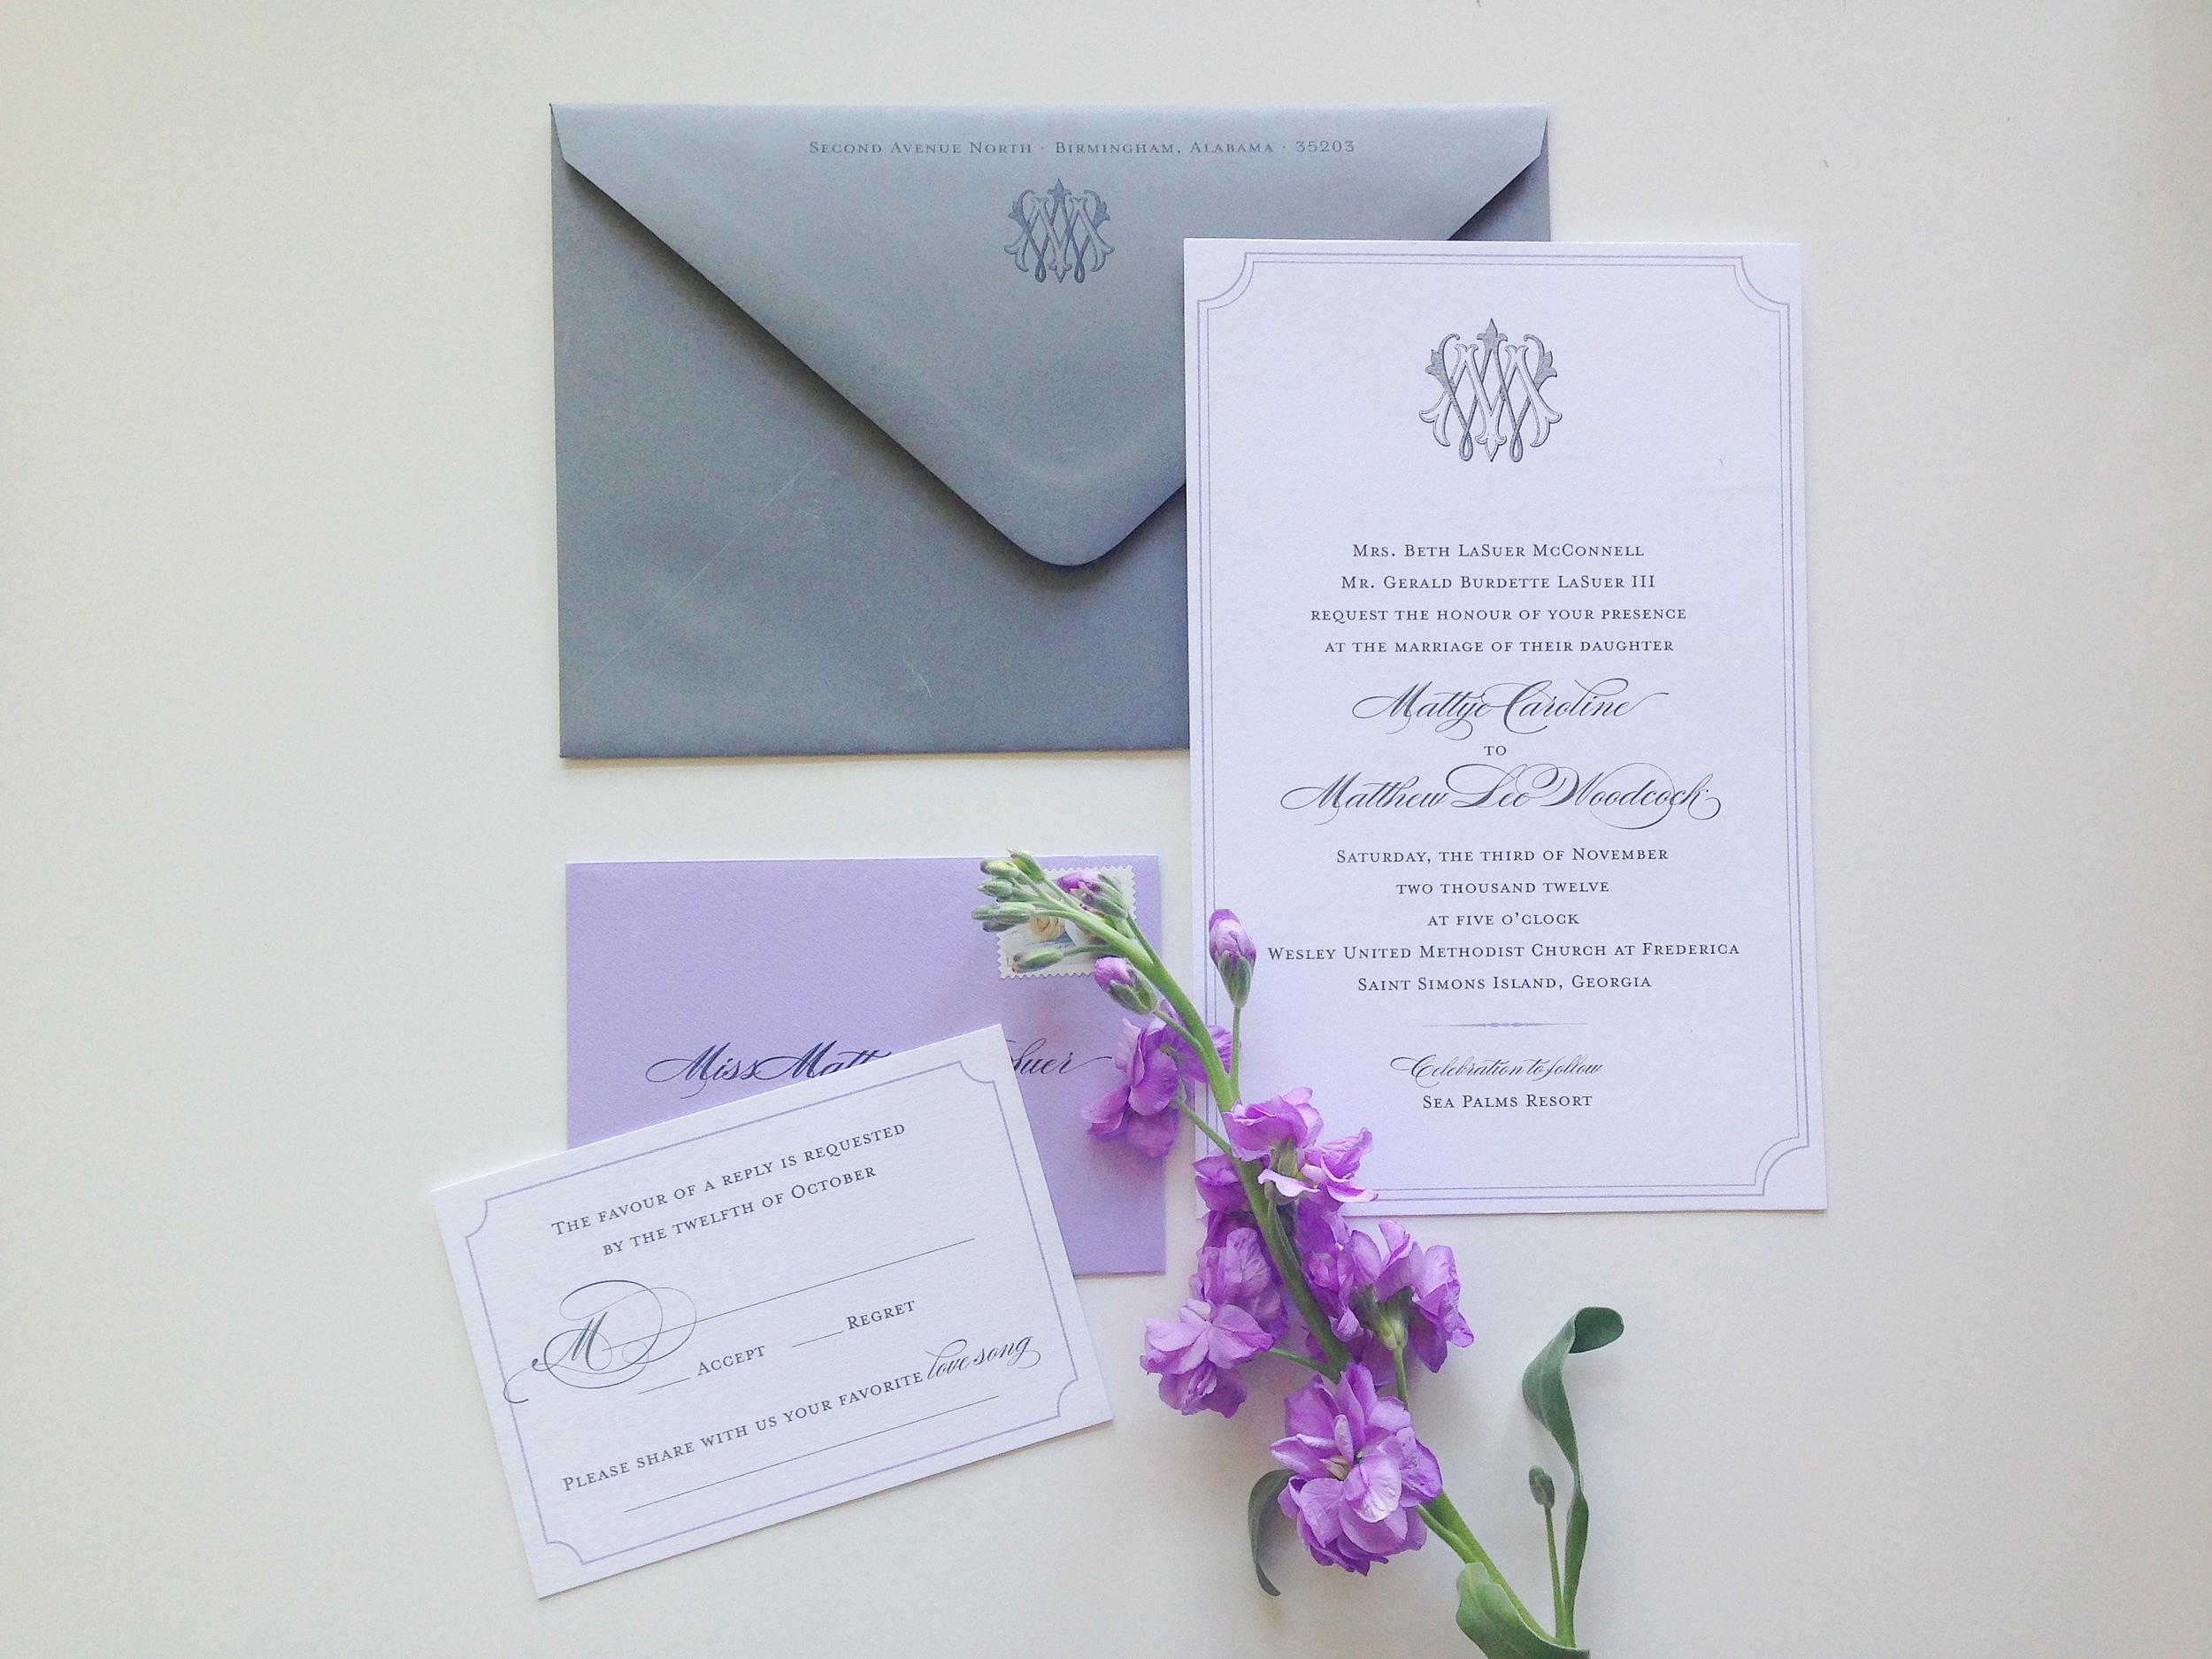 custom invitation suite by  Weddings Etc.  of Homewood, AL